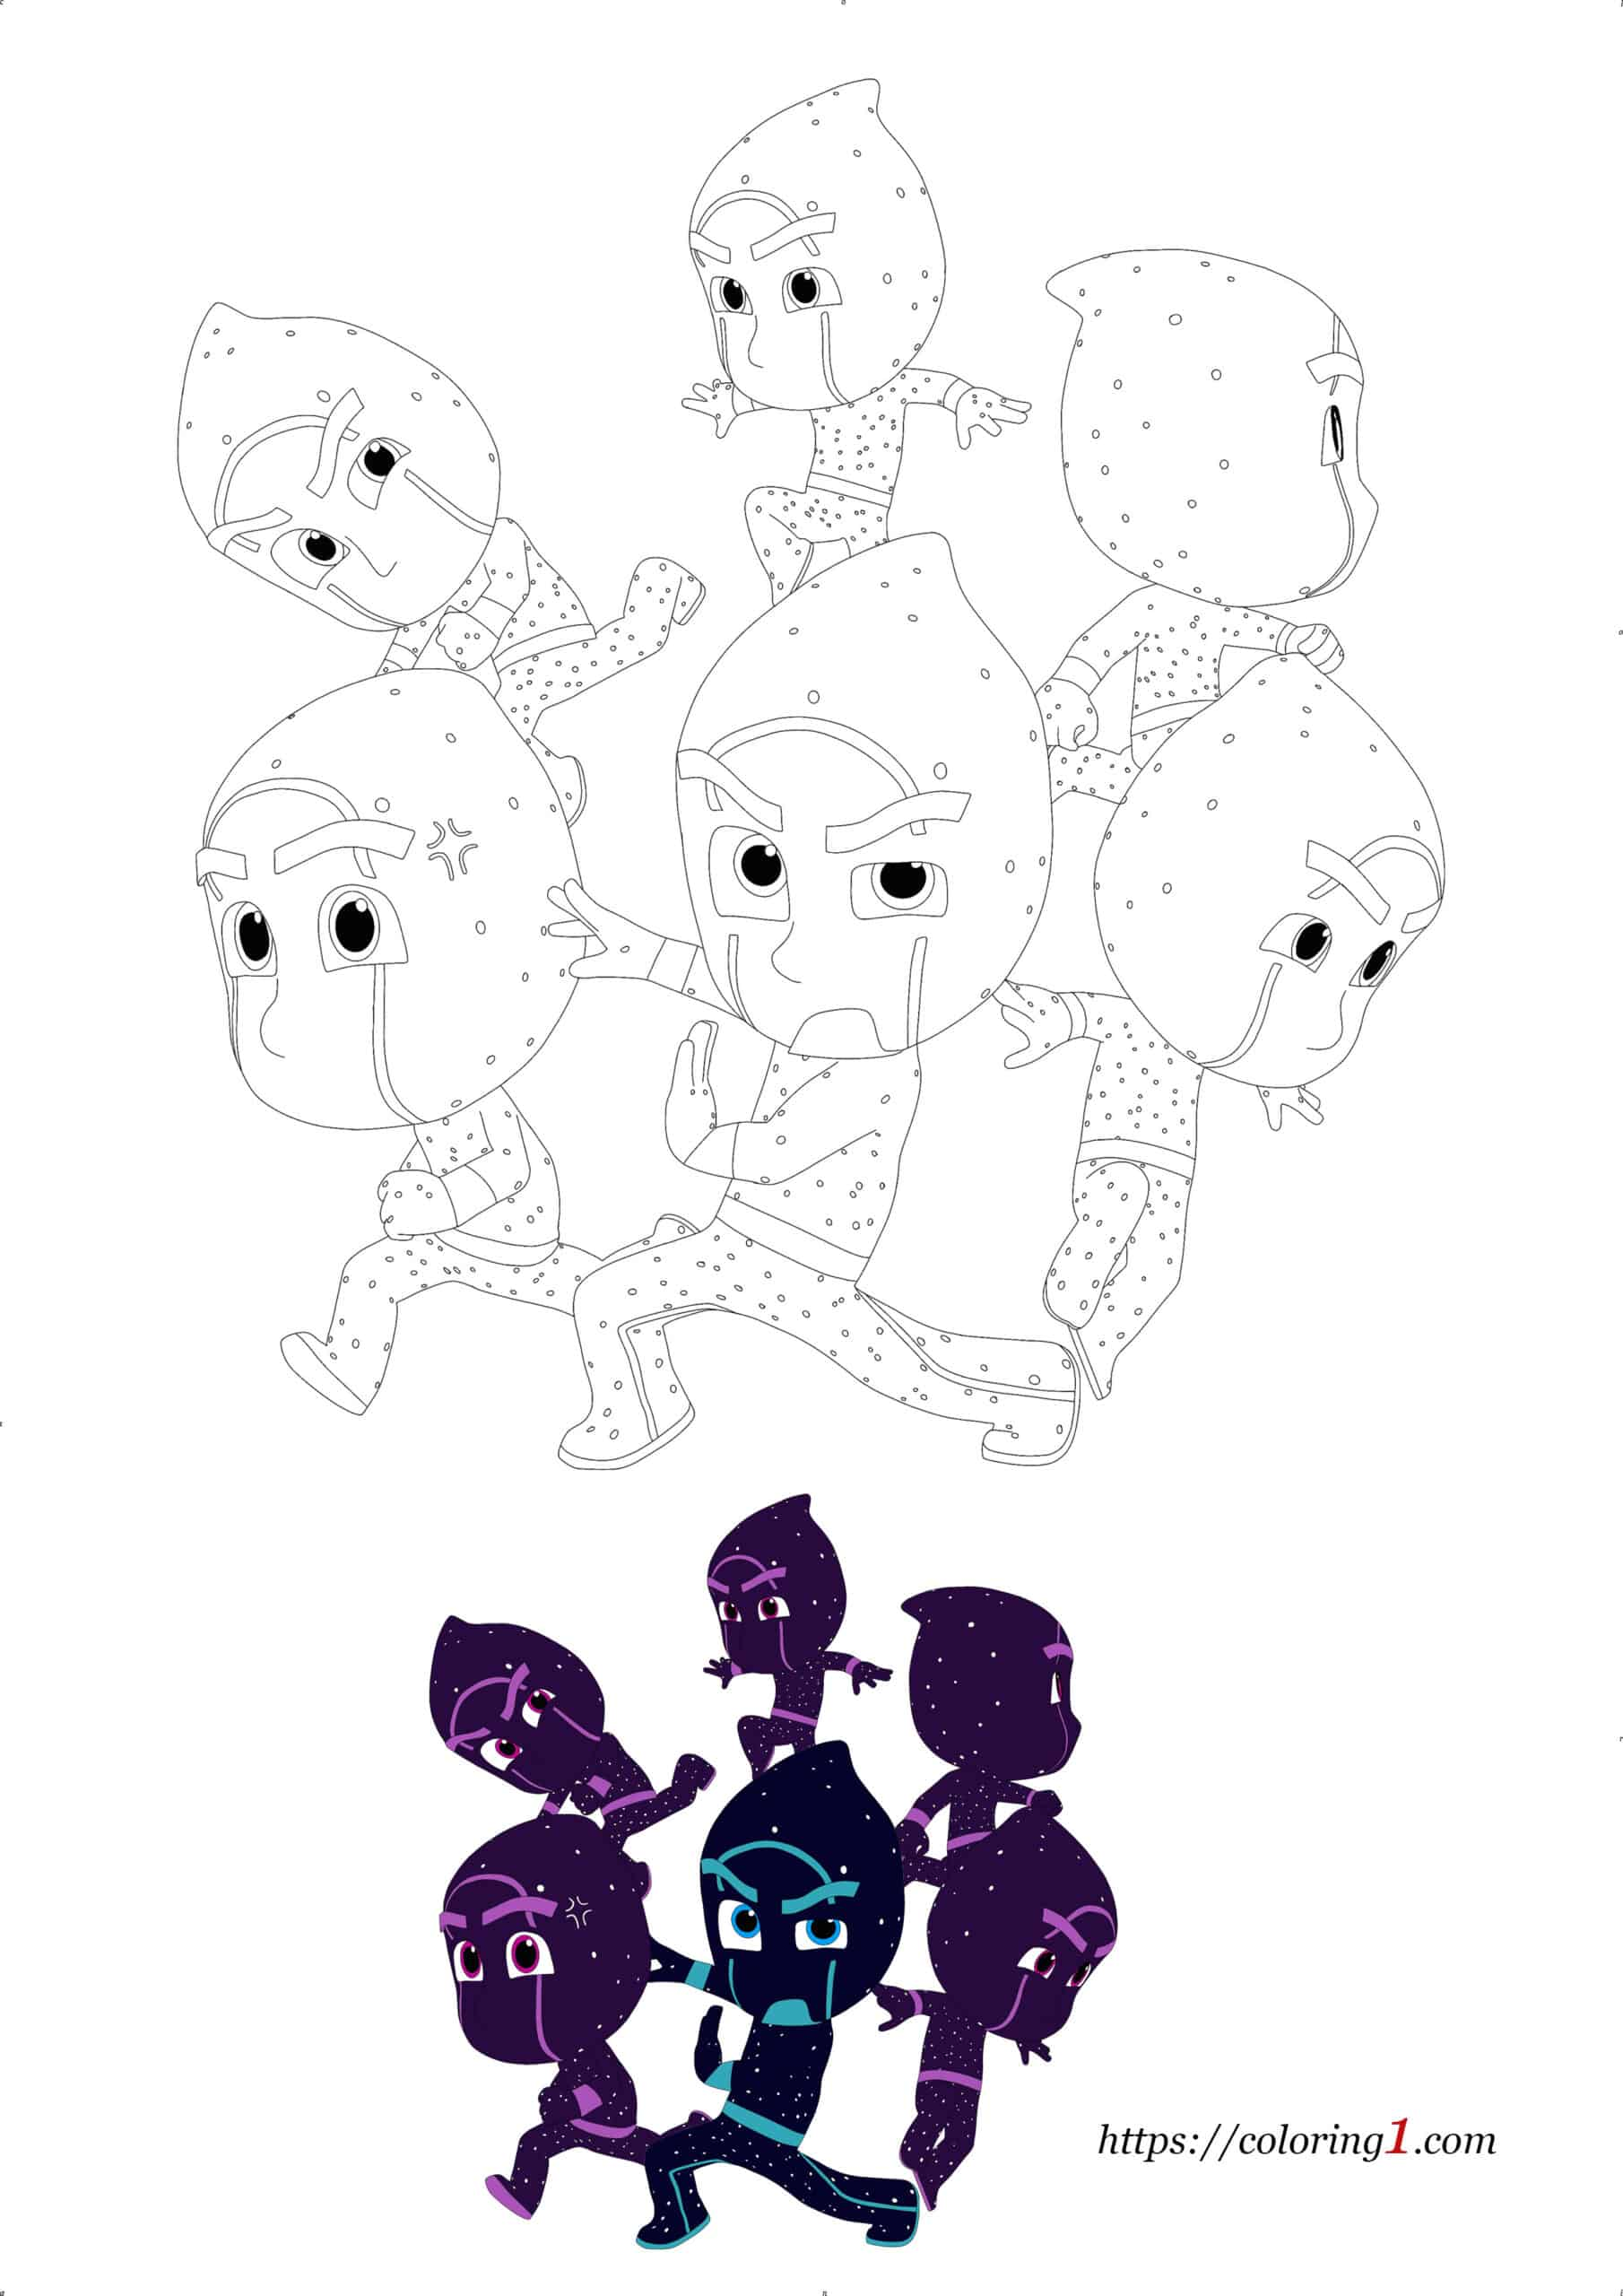 Pj Masks Night Ninja and Ninjalinos coloring page for kids